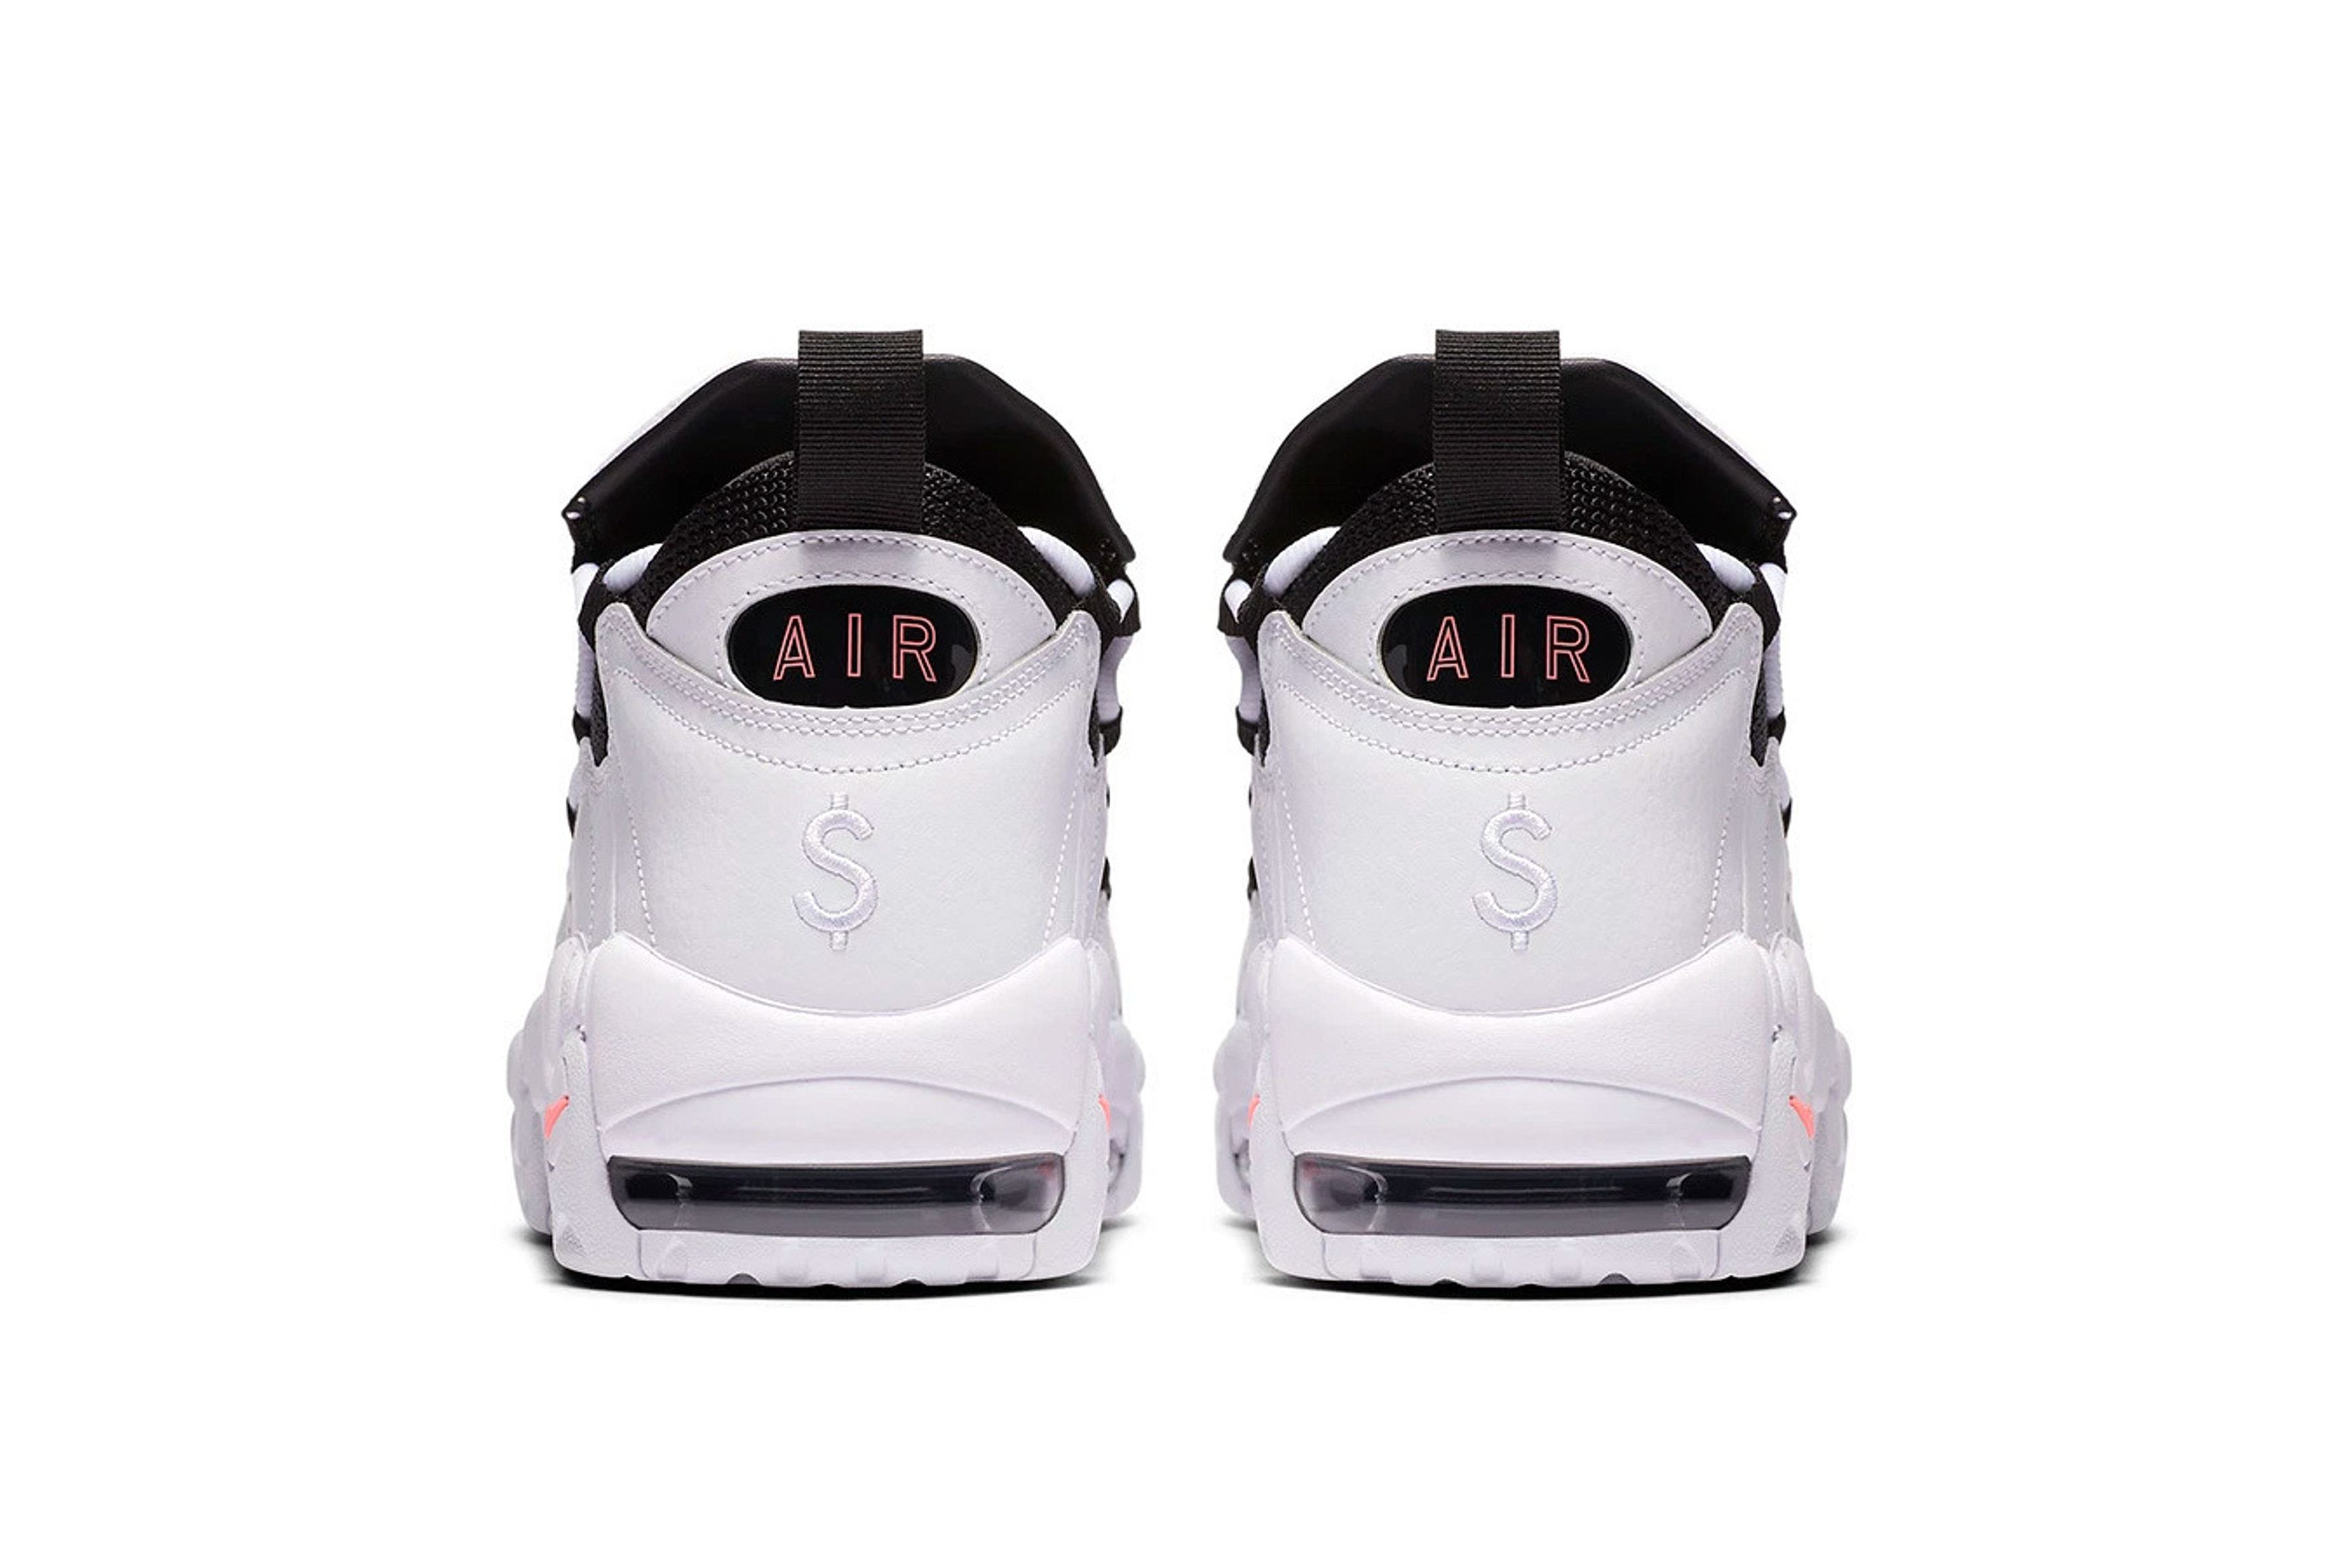 Nike Air More Money Piggy Bank Release Date 5 Sneaker Freaker